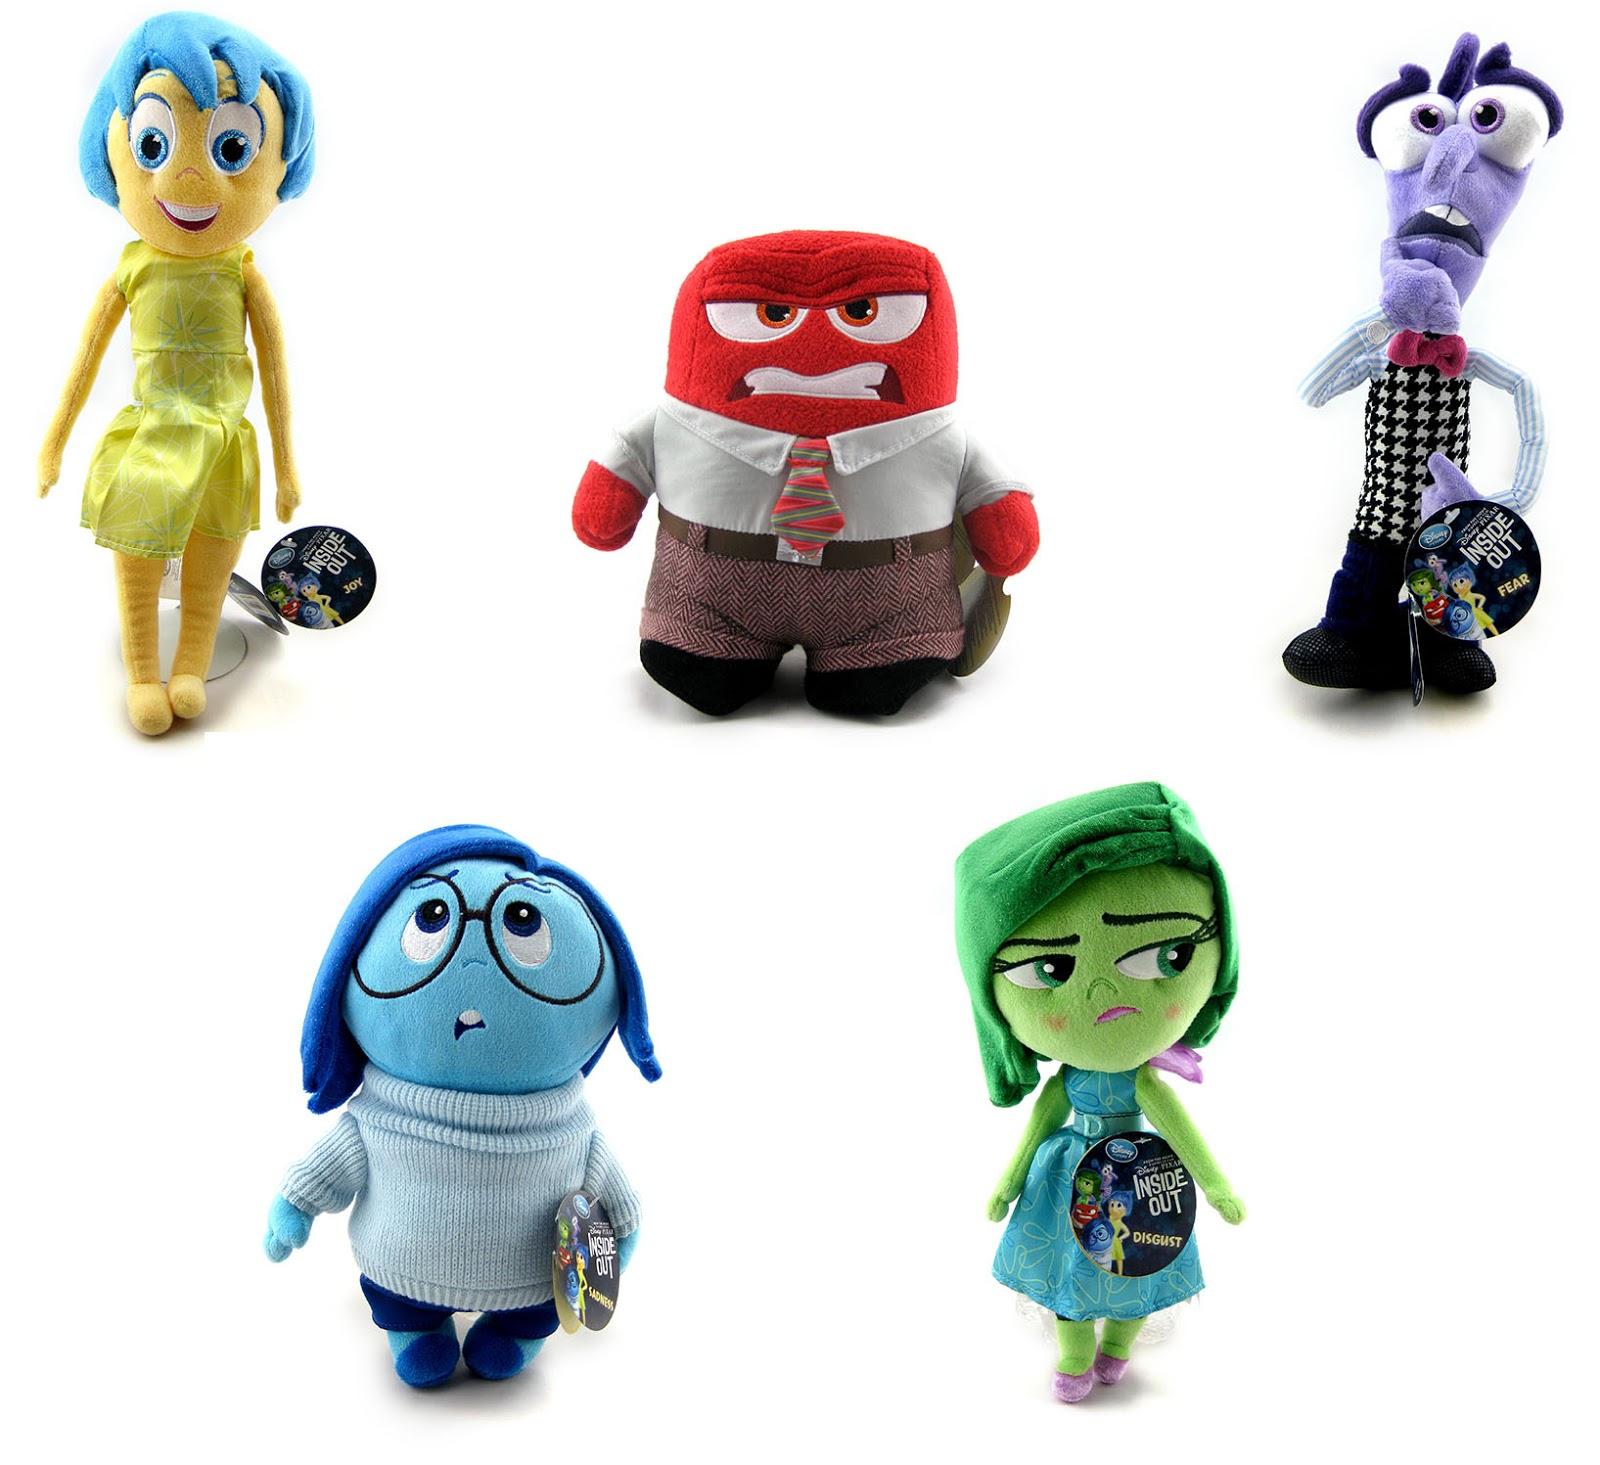 Disney Store Toys : Dan the pixar fan inside out disney store plush